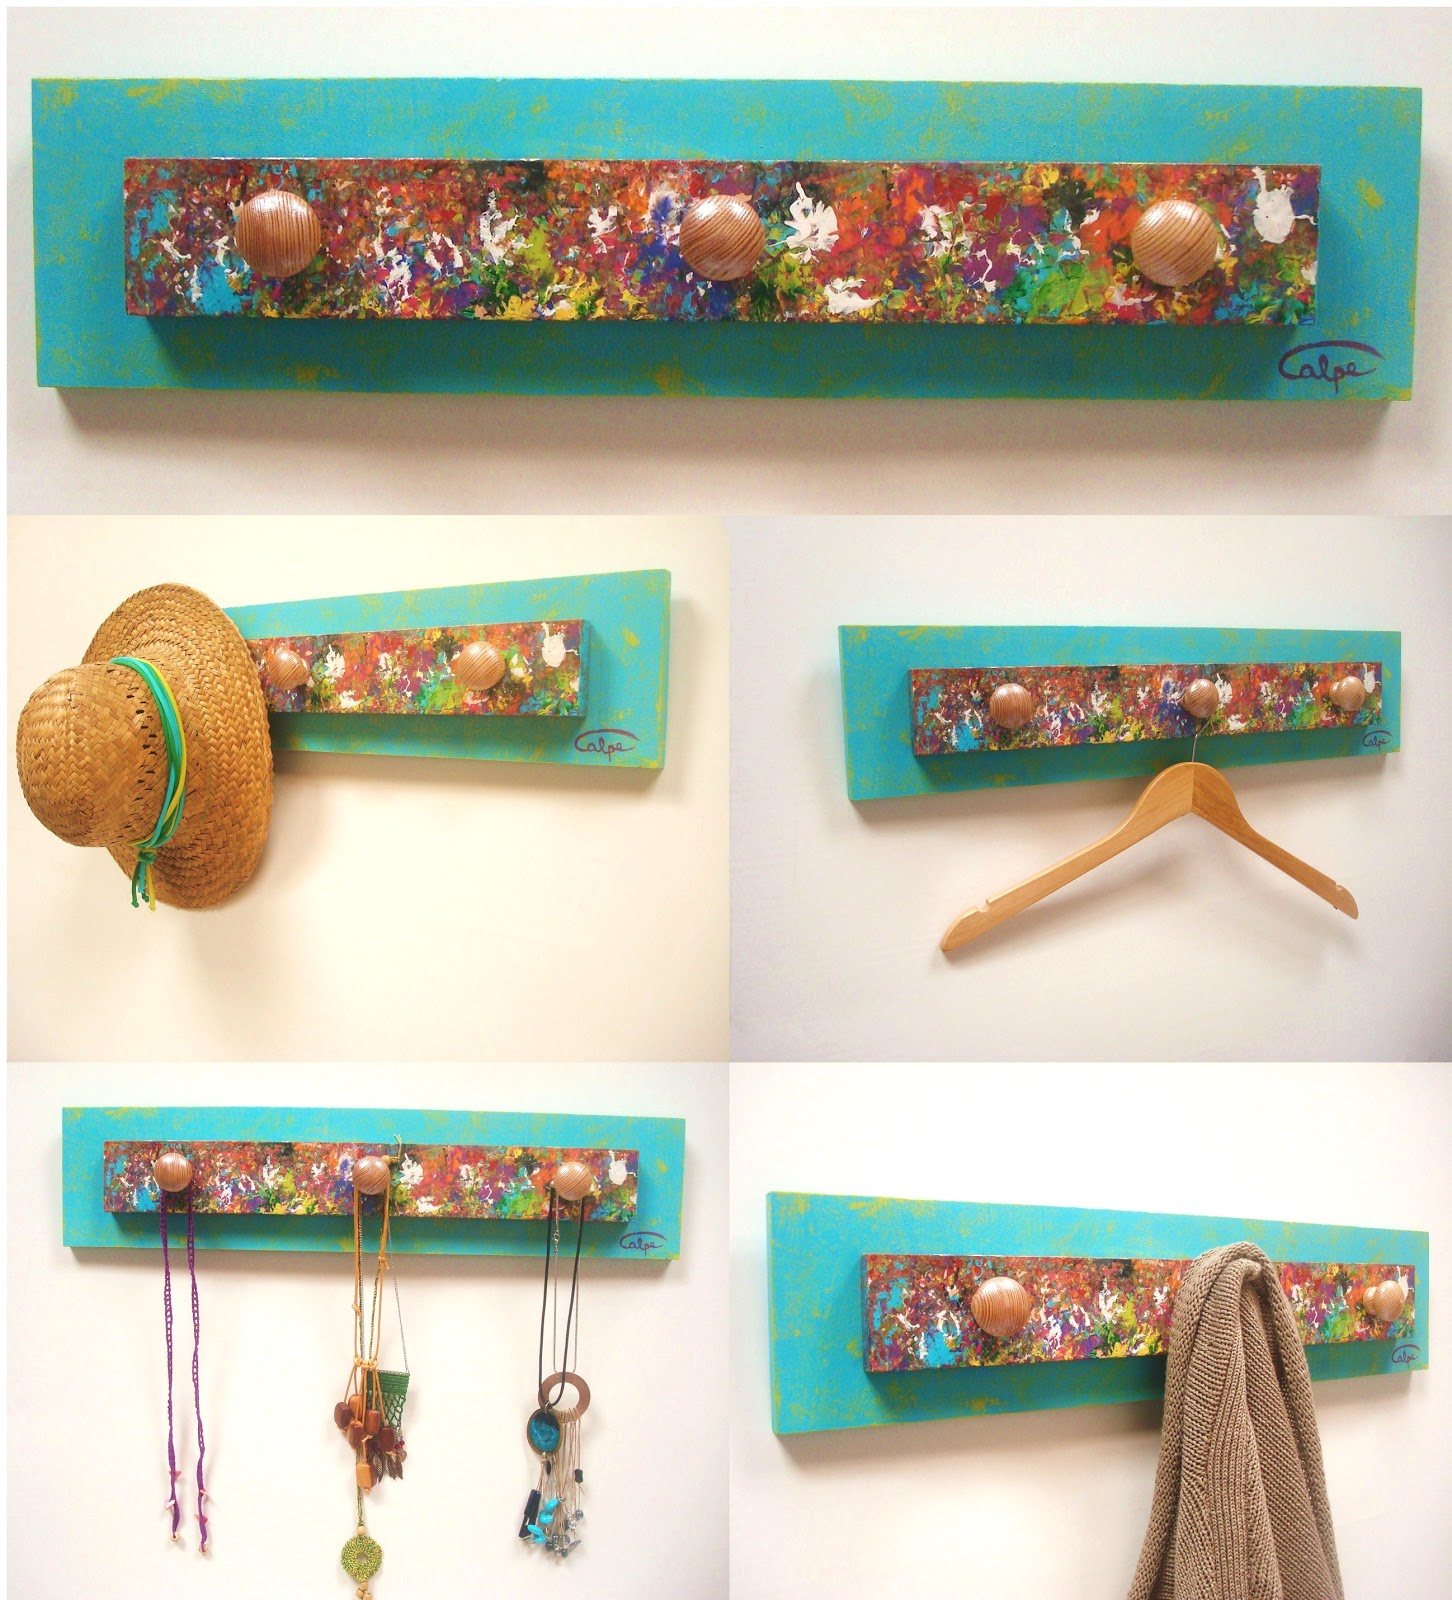 Calpearts muebles y accesorios pintados a mano for Bares decorados con madera